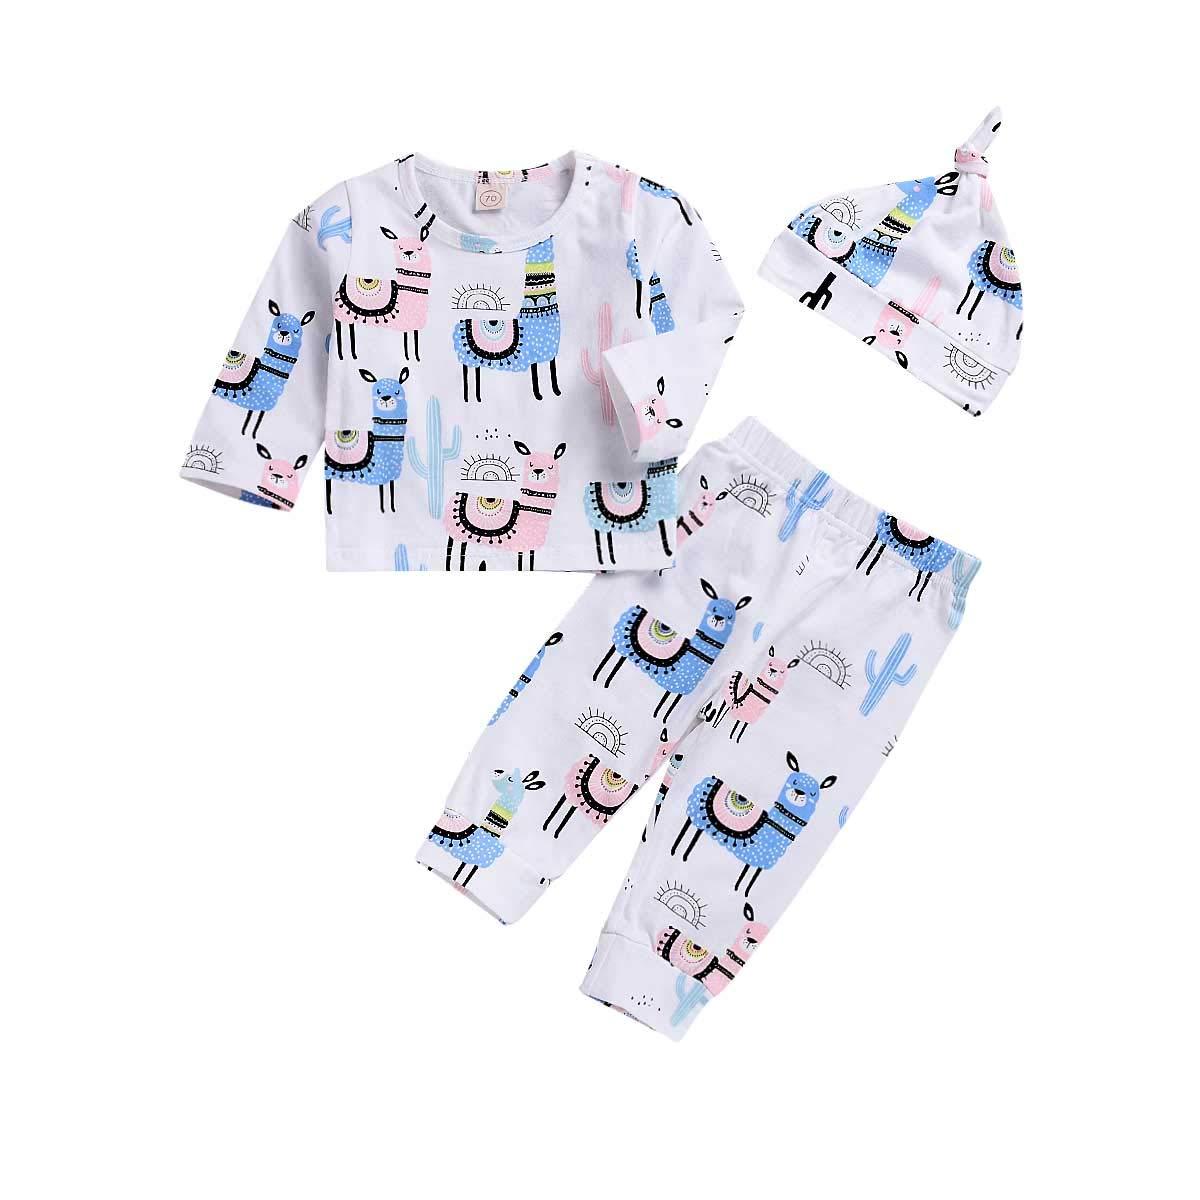 36dfa299382 Amazon.com  Baby Girls Boys Clothes Newborn Baby Girl Boy Animal Print  Romper Infant Alpaca Bodysuit Cactus Jumpsuit Long Sleeve Outfit  Clothing